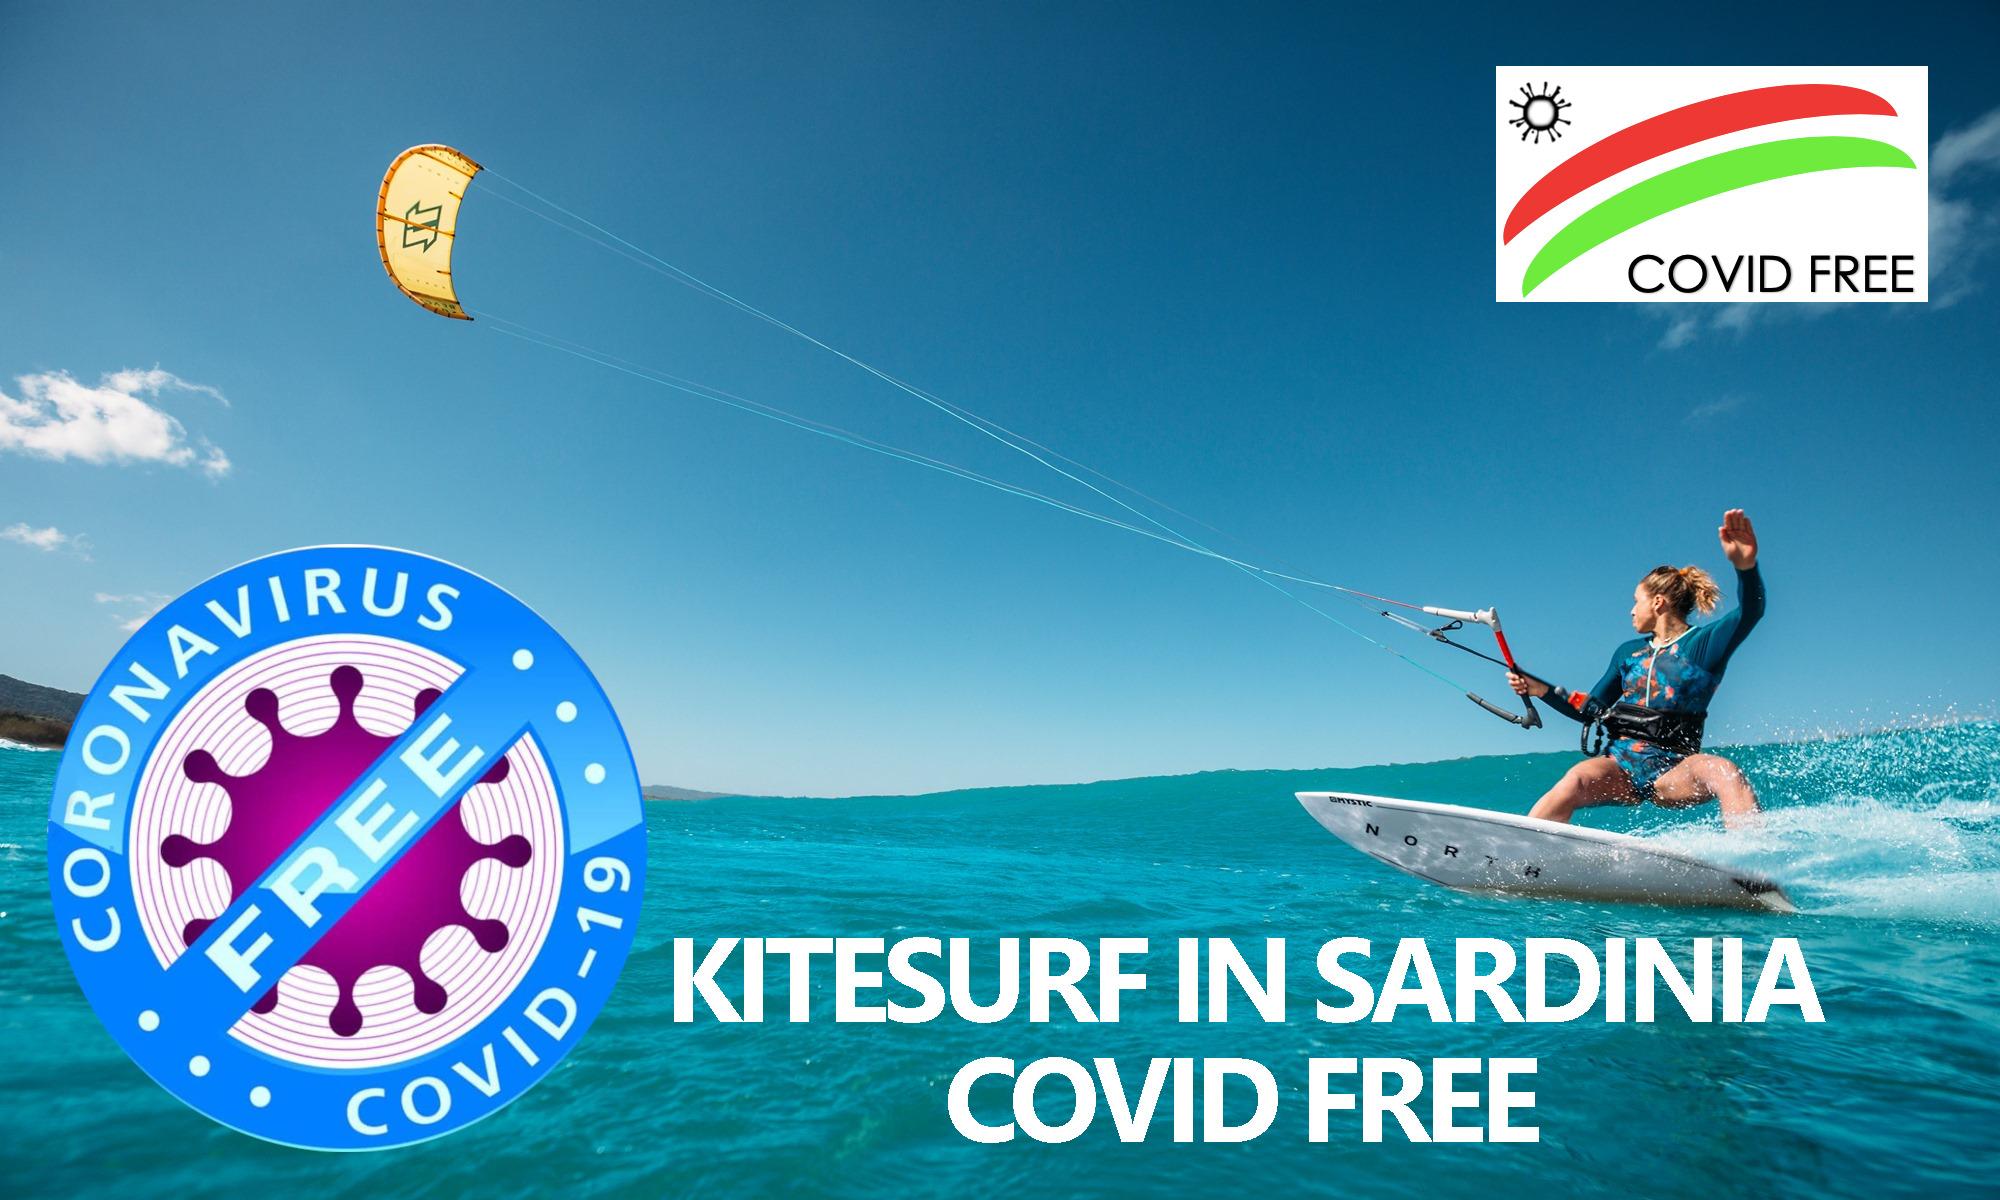 Kitesurfing in Safety with no Corona Virus - Kitesurf is sardinia Covd Free